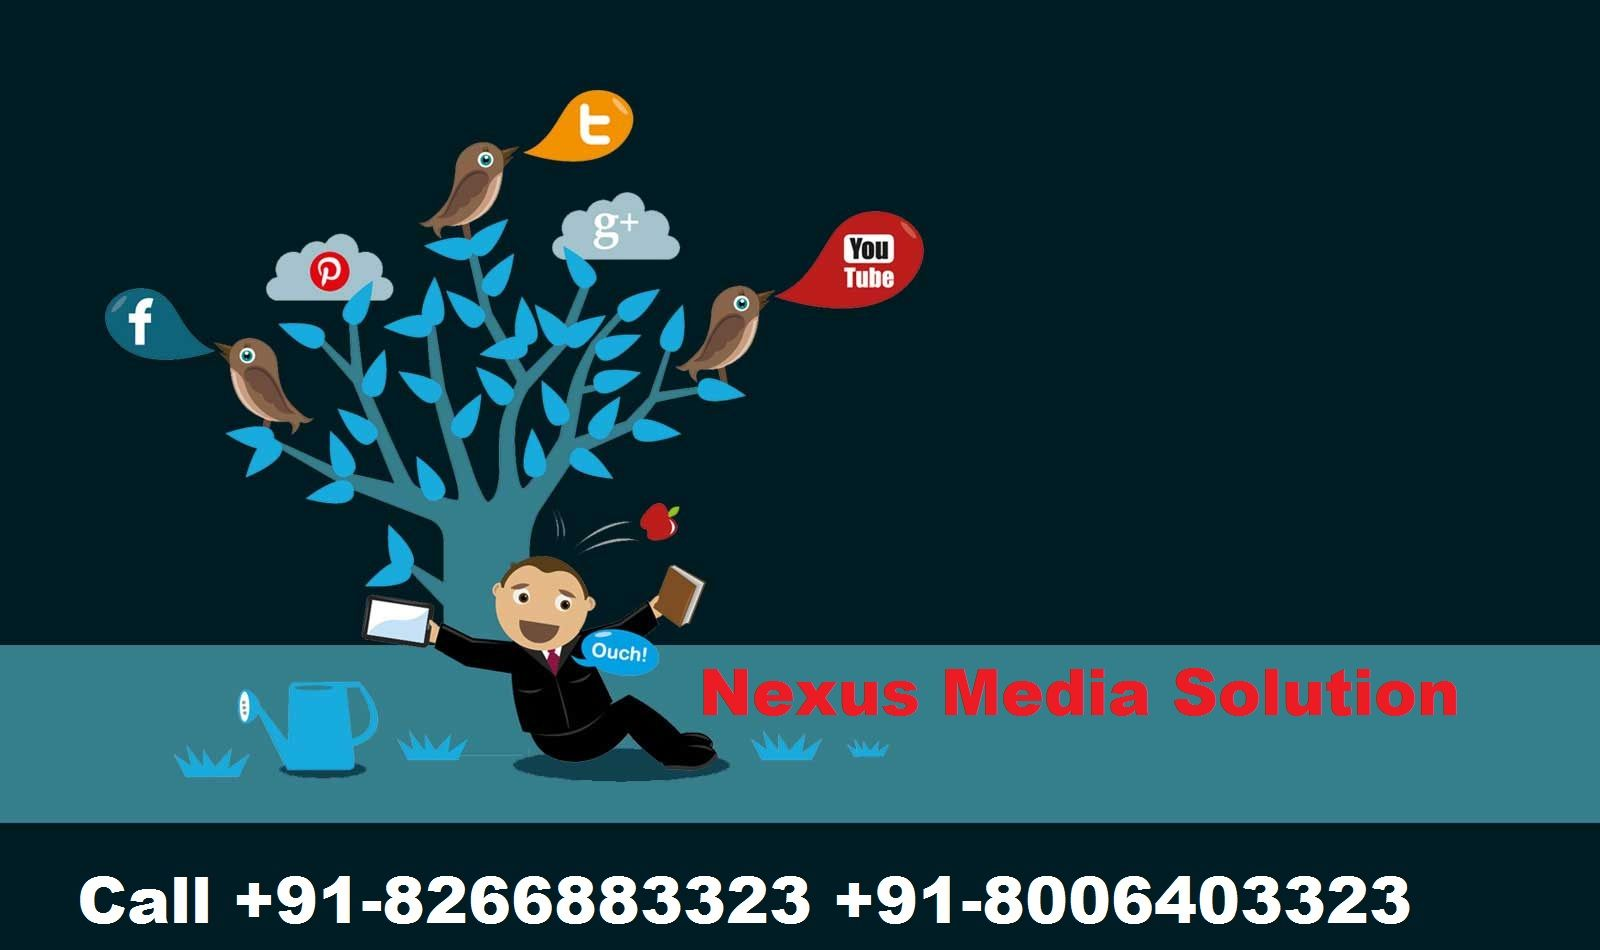 Website designing Company Haridwar | +91-8006403323 | Web Design Haridwar